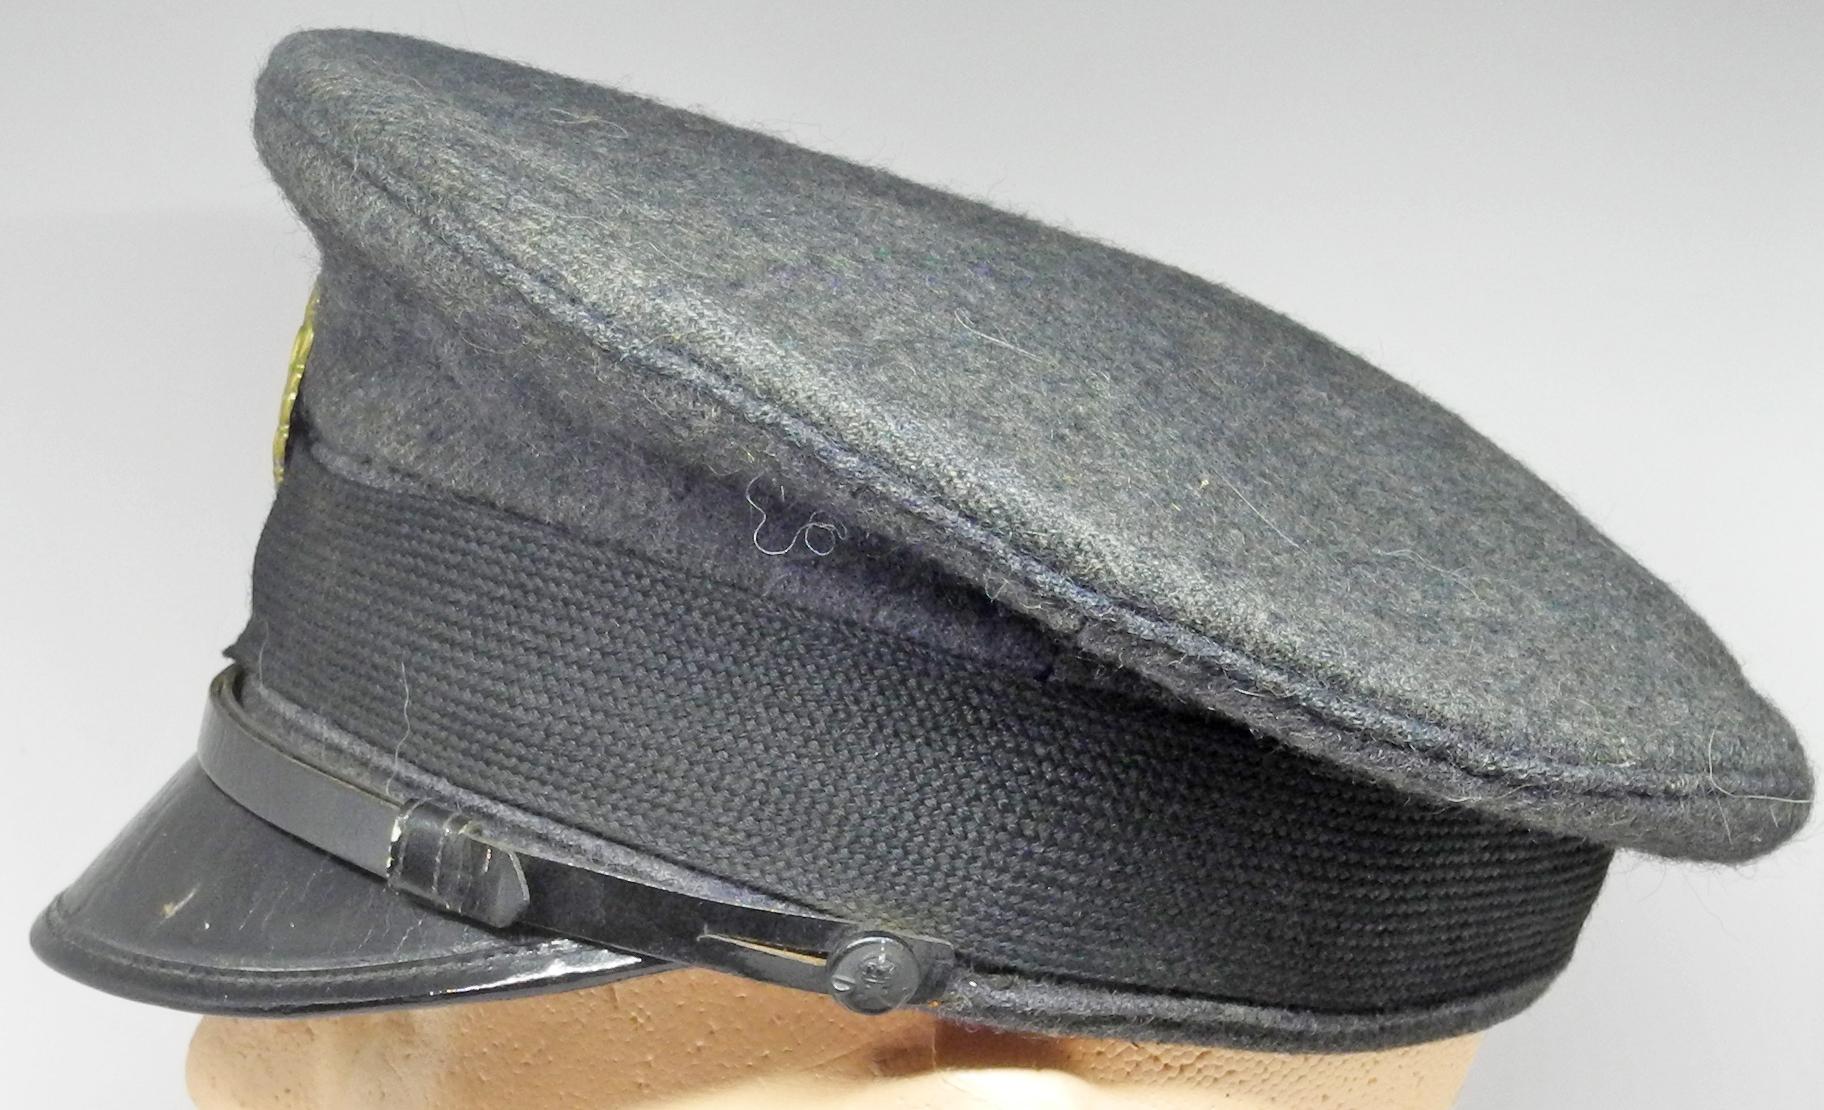 RAF Other Ranks visor cap 1939